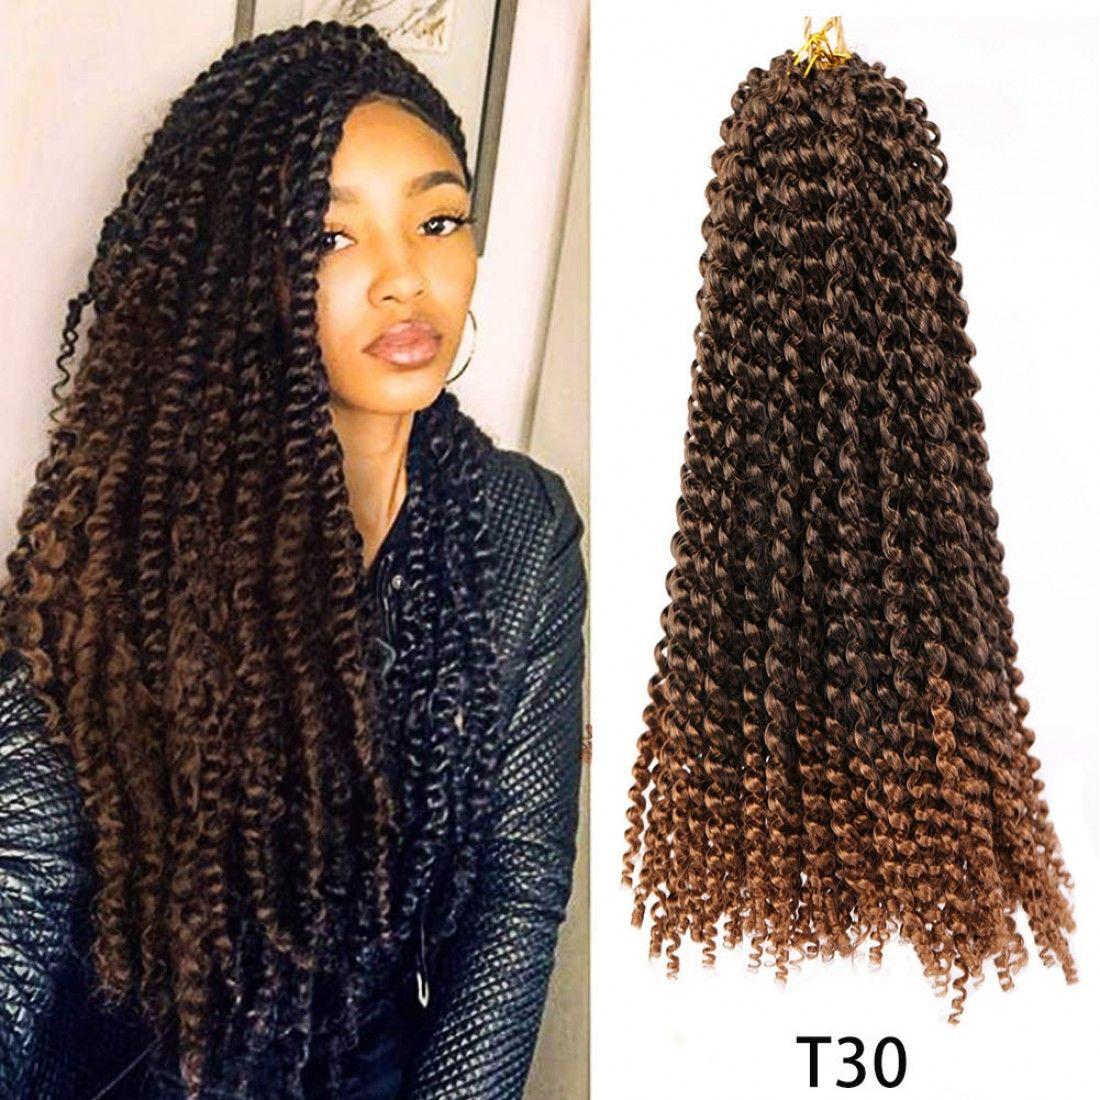 18 Inch Passion Twist Crochet Hair Twist Hairstyles Crochet Hair Styles Crochet Braids Hairstyles